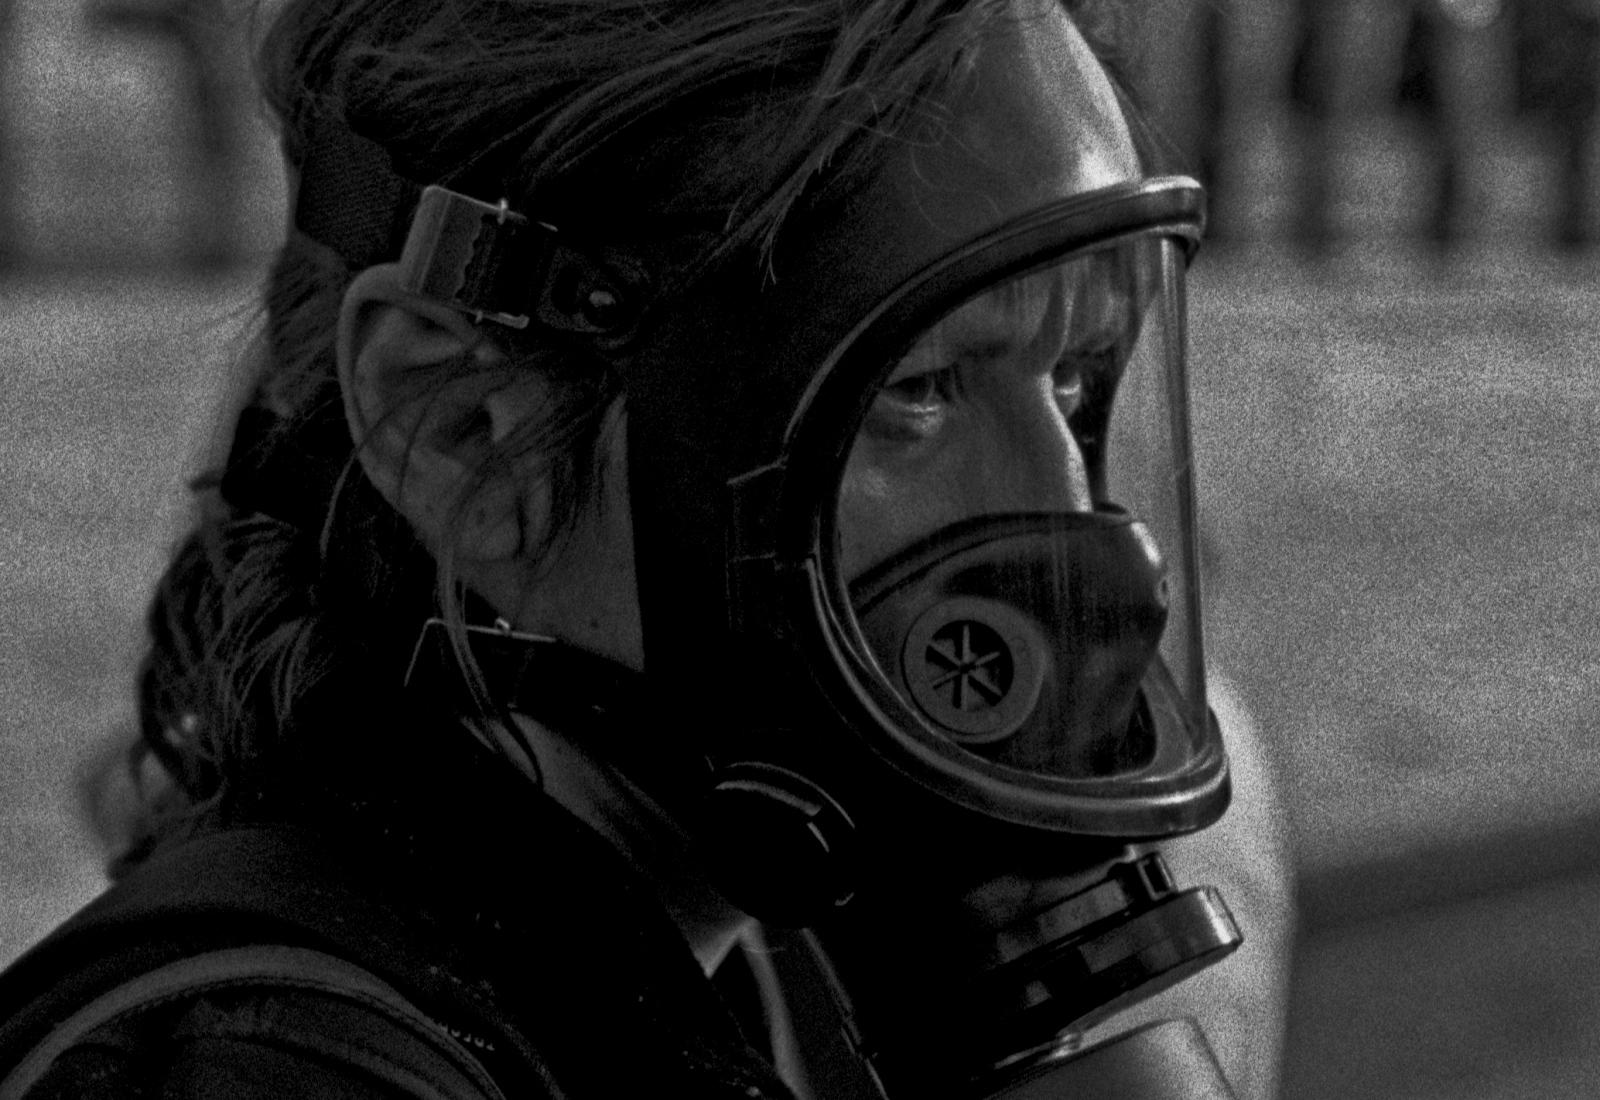 Mask of anactivist